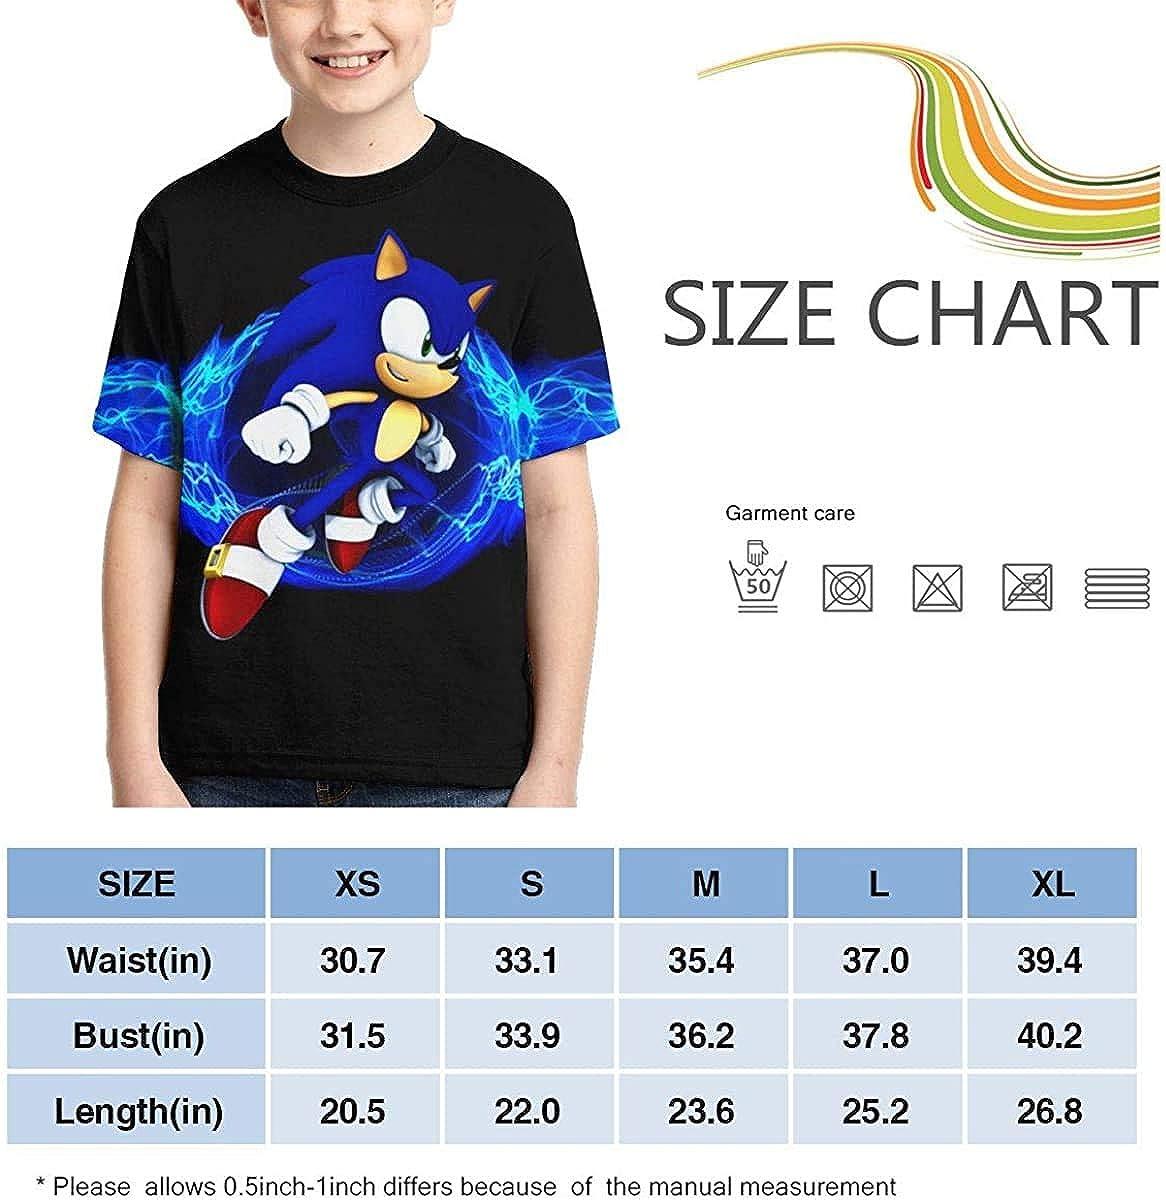 guoweiweiB T-Shirt Bambini e Ragazzi Sonic The Hedgehog Style Kids 3D Print Shirt Toddlers 100/% Polyester Cool T-Shirt